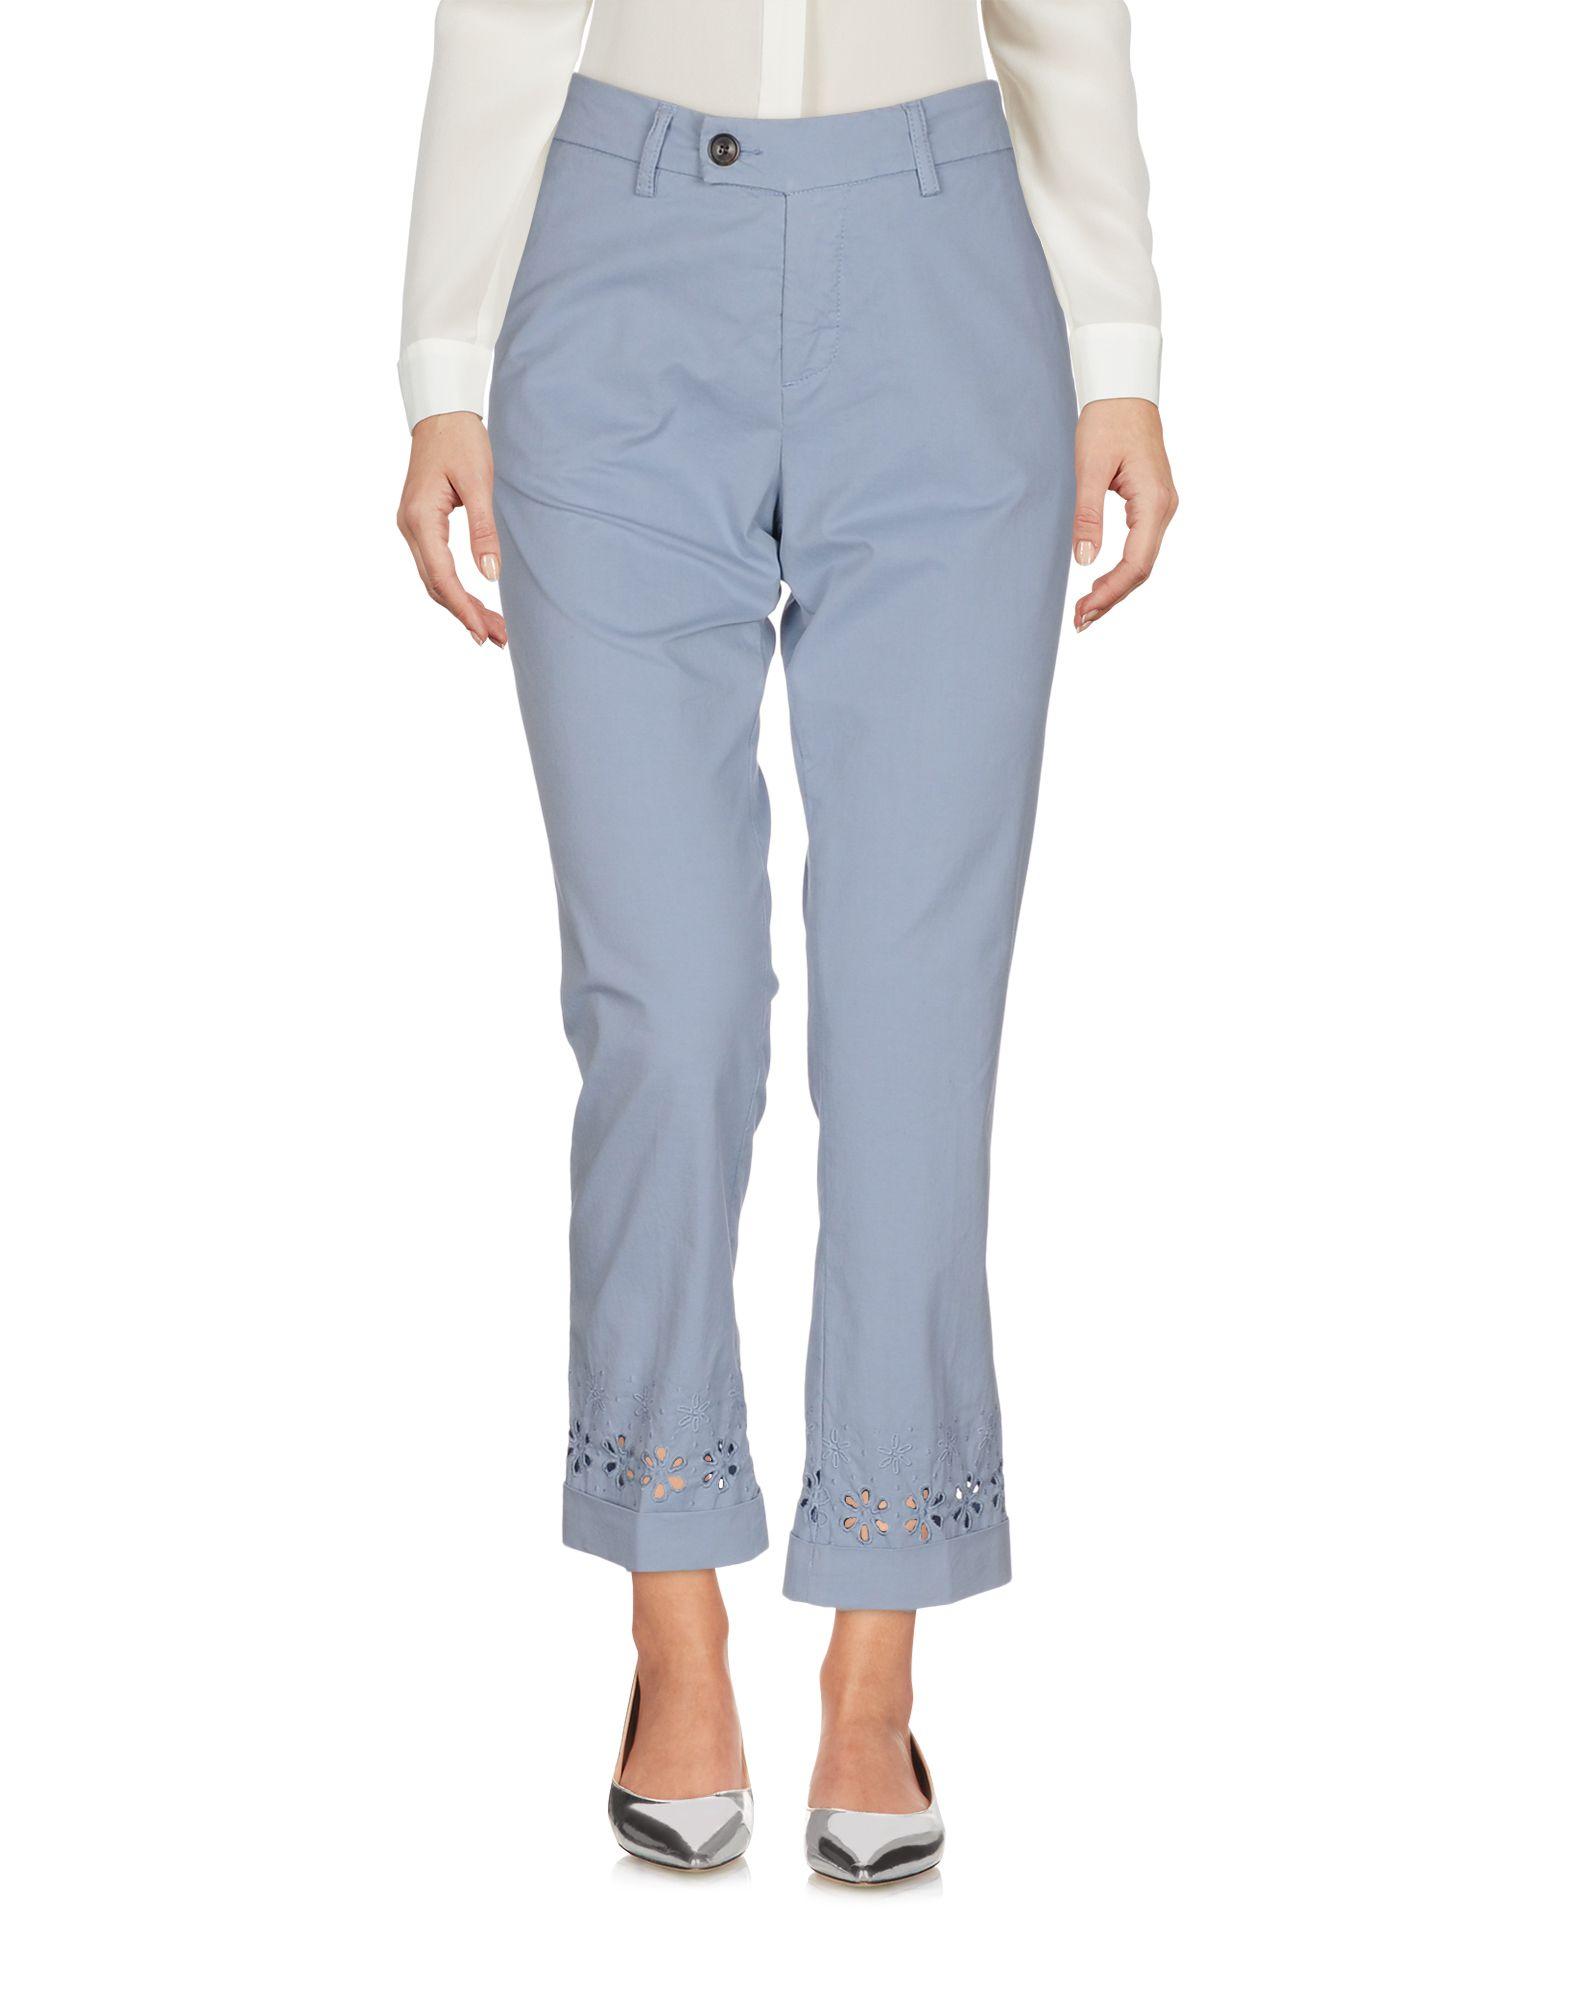 Pantalone Dritto True Nyc. Donna - Acquista online su jXTgkKQl7